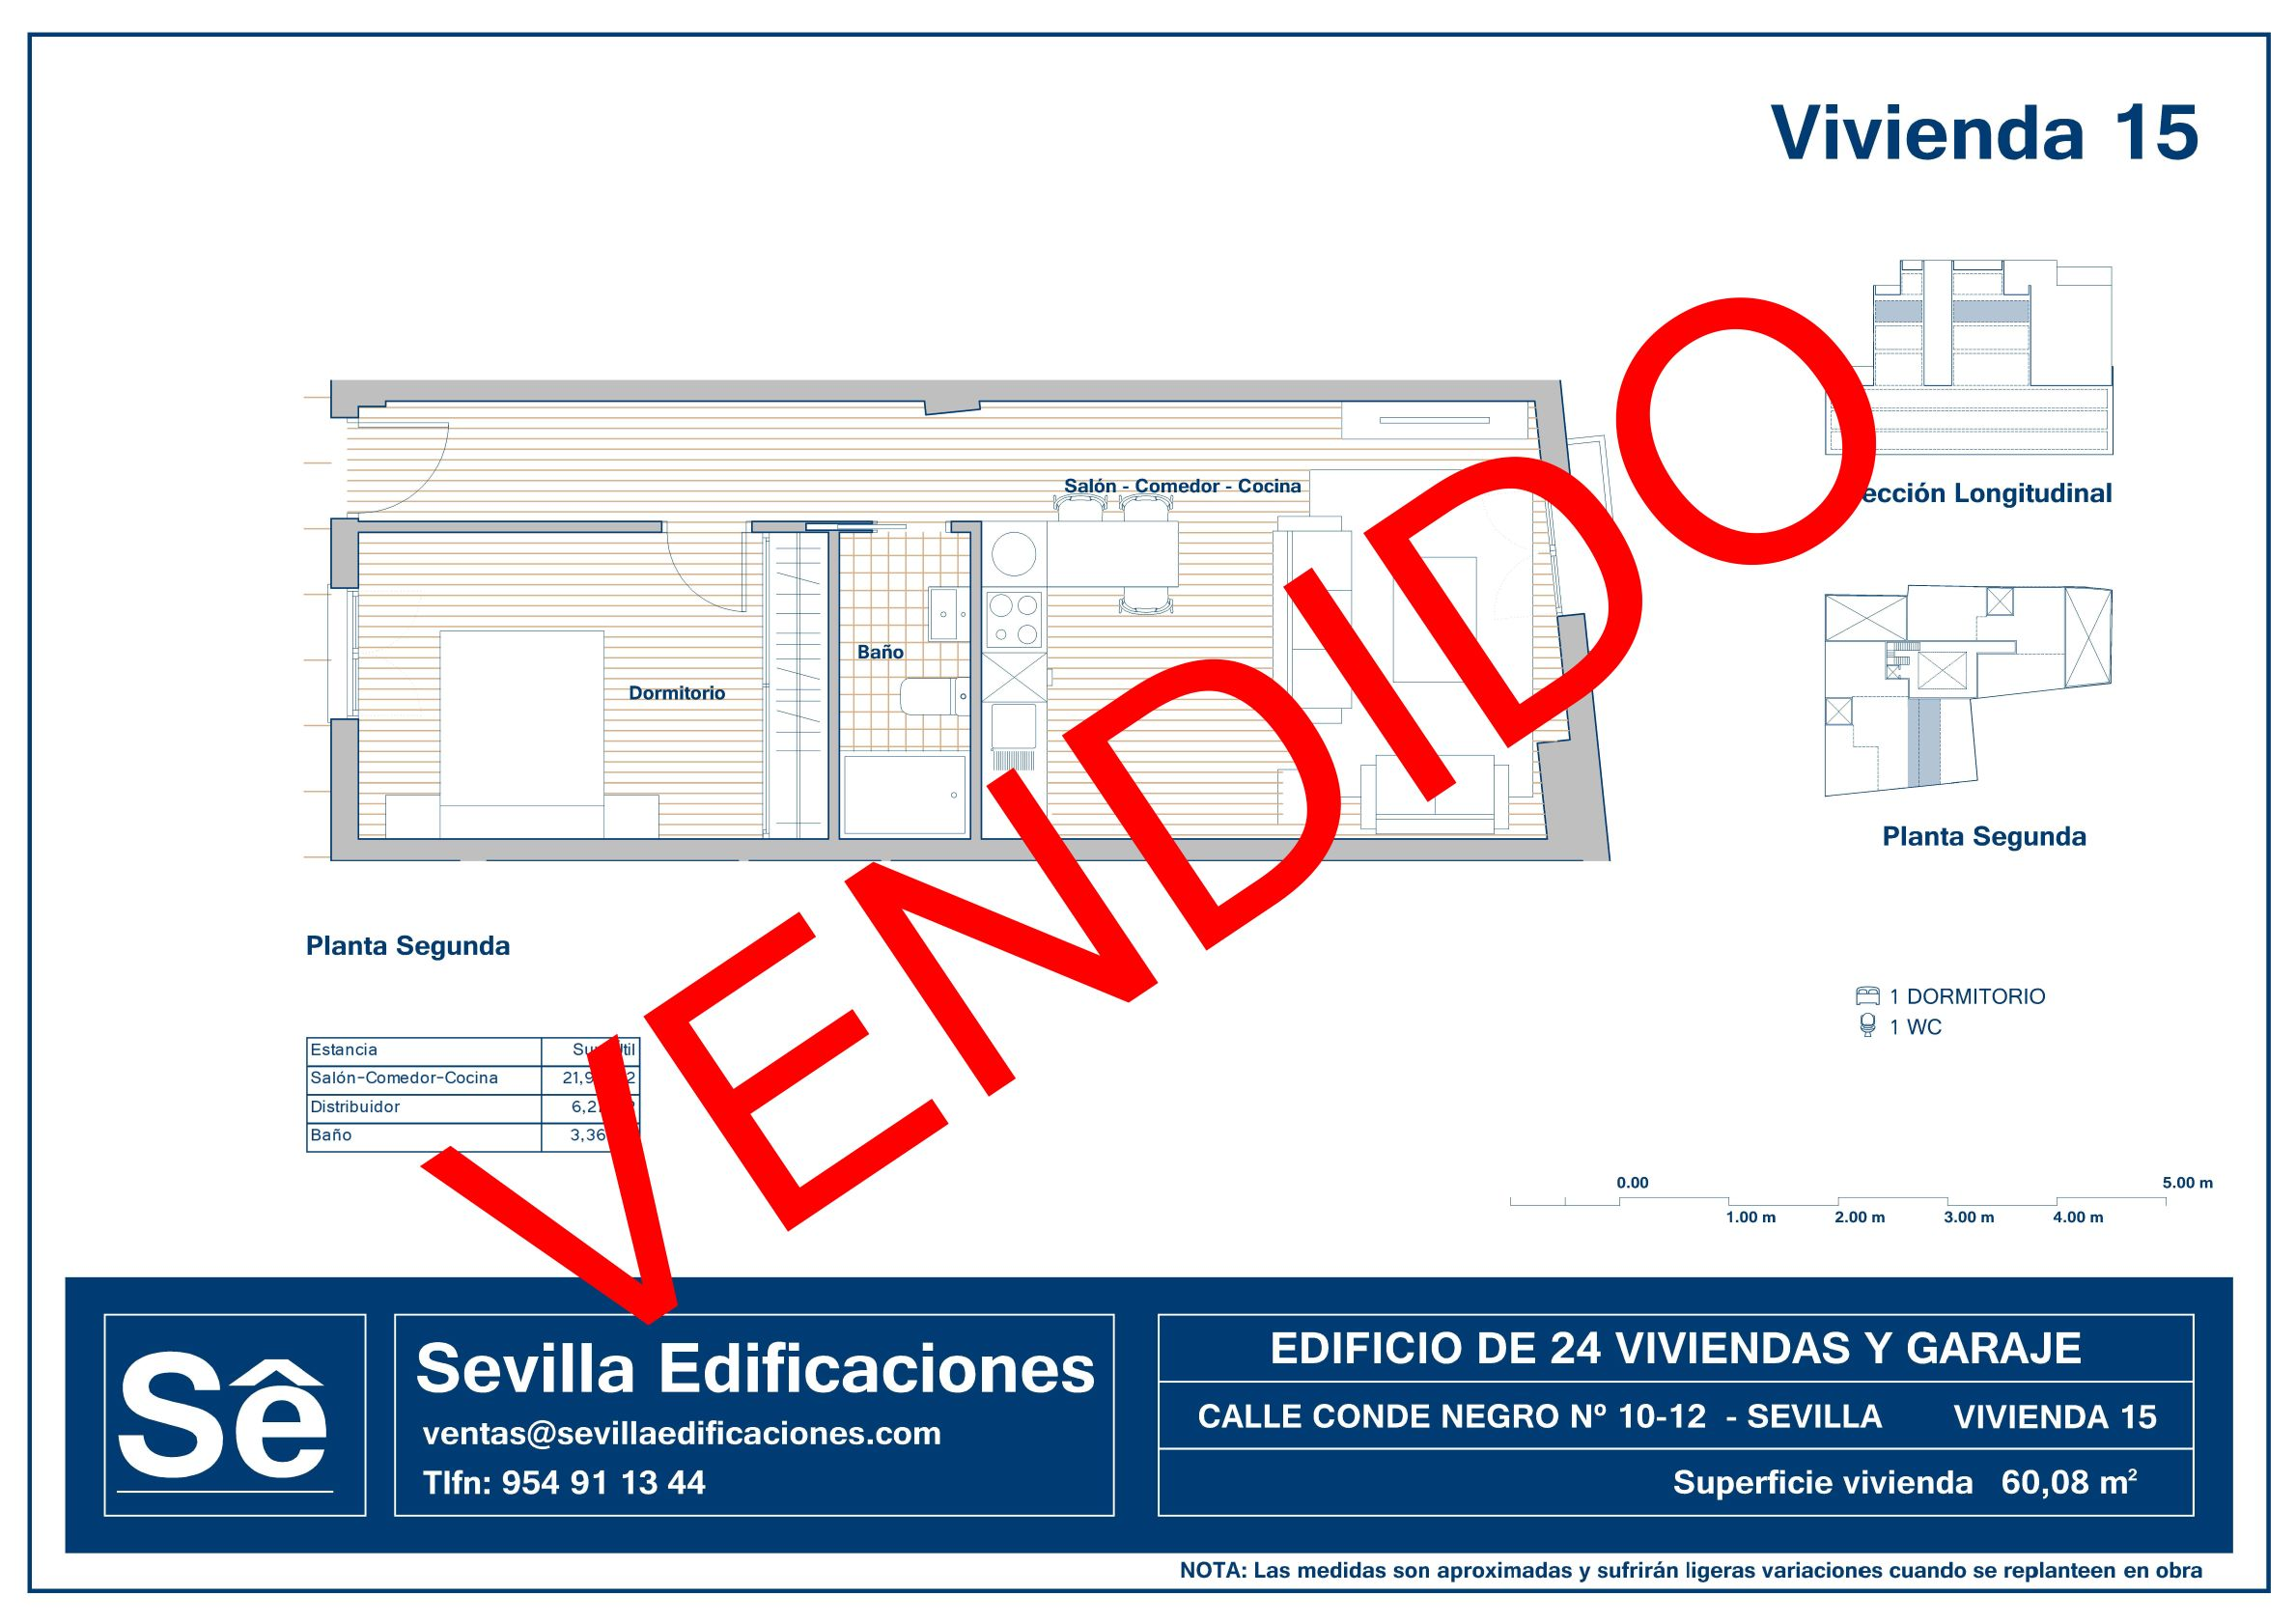 CONDENEGRO_VIVIENDA_15_VENDIDO